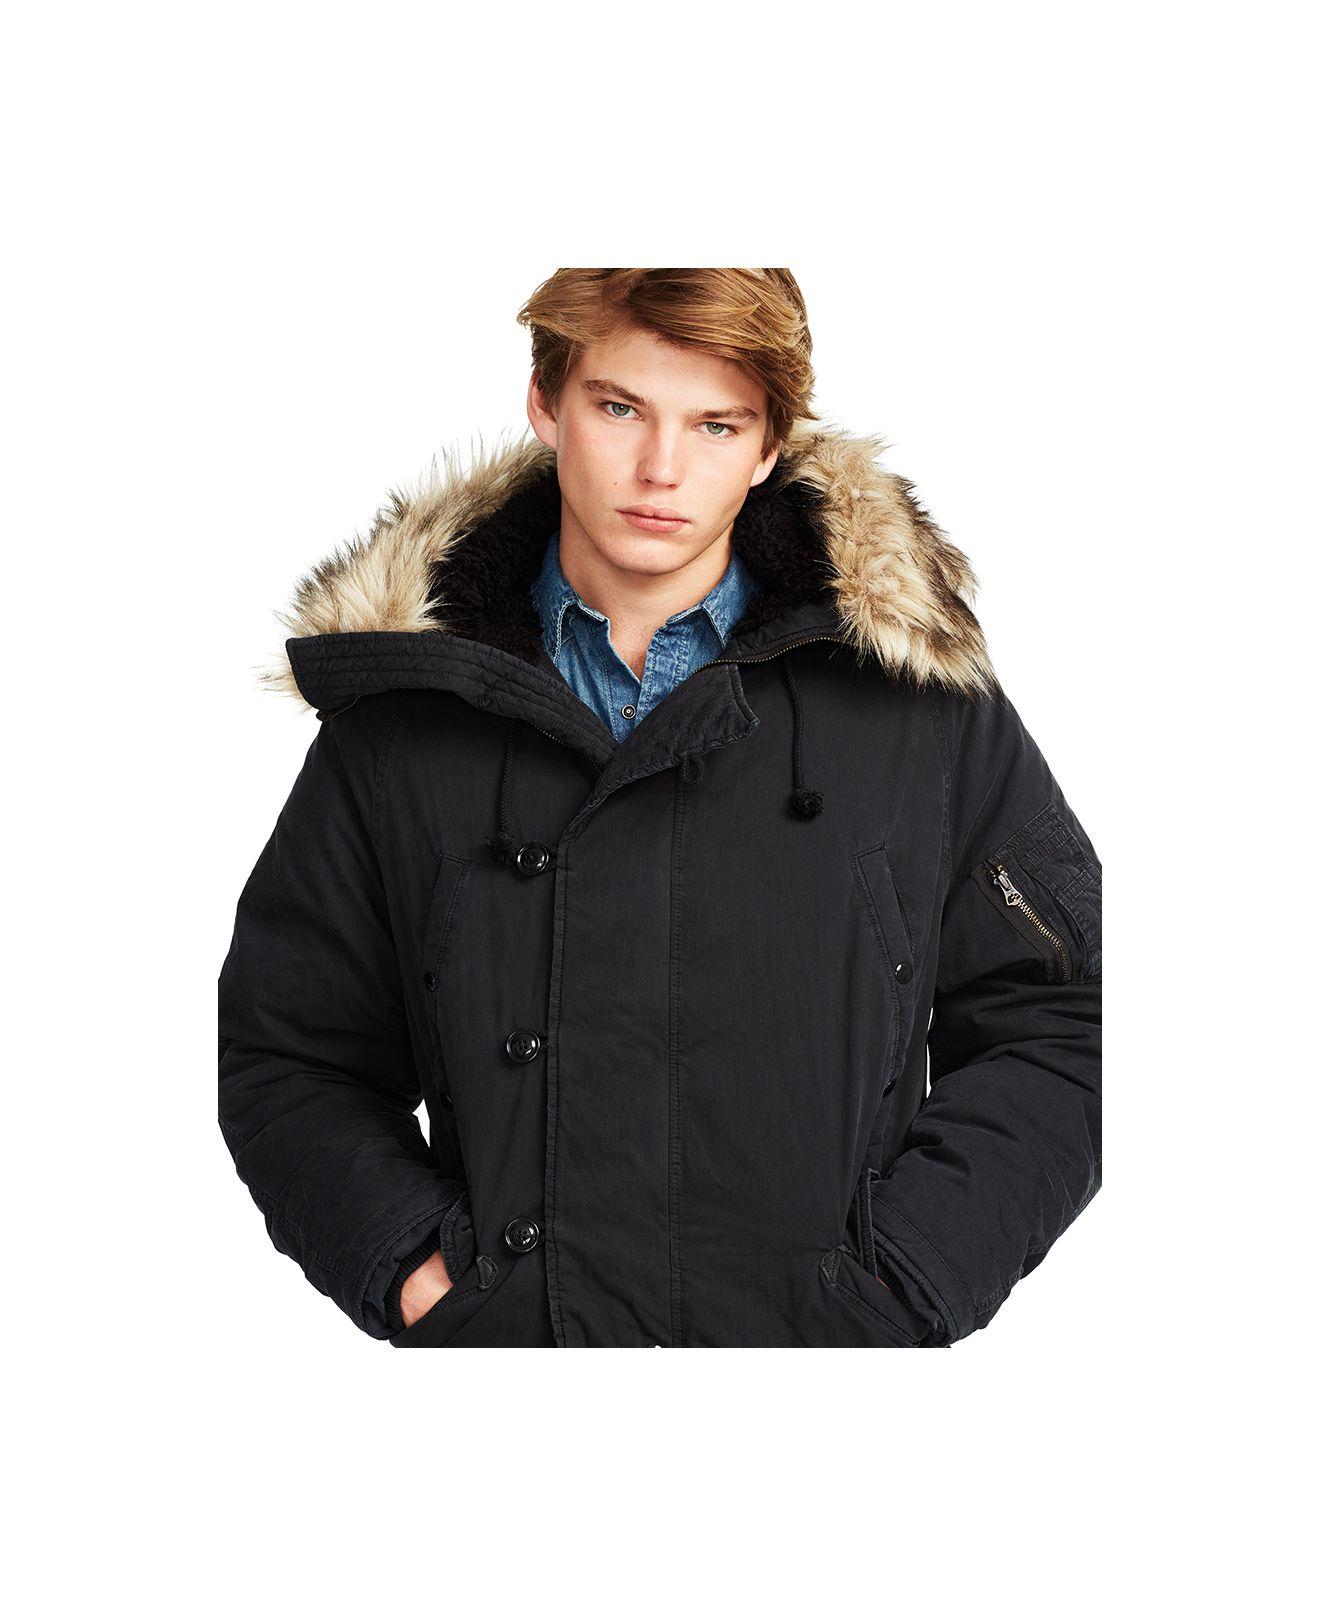 ae5b3dbd90ee Lyst - Denim   Supply Ralph Lauren Down Snorkel Jacket in Black for Men